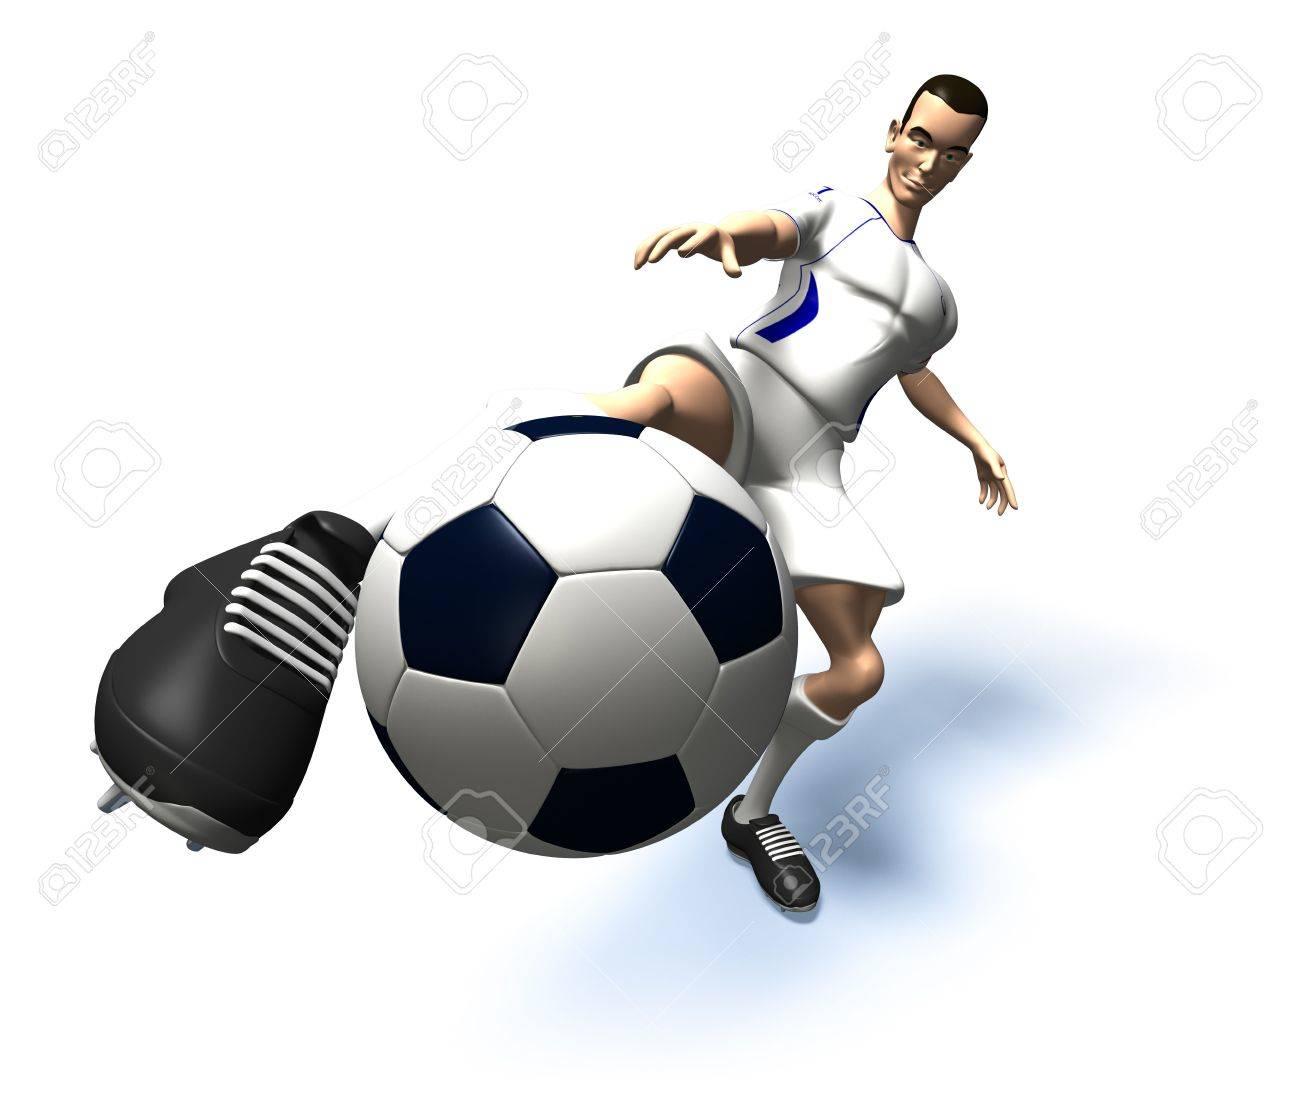 Football player Stock Photo - 3321824